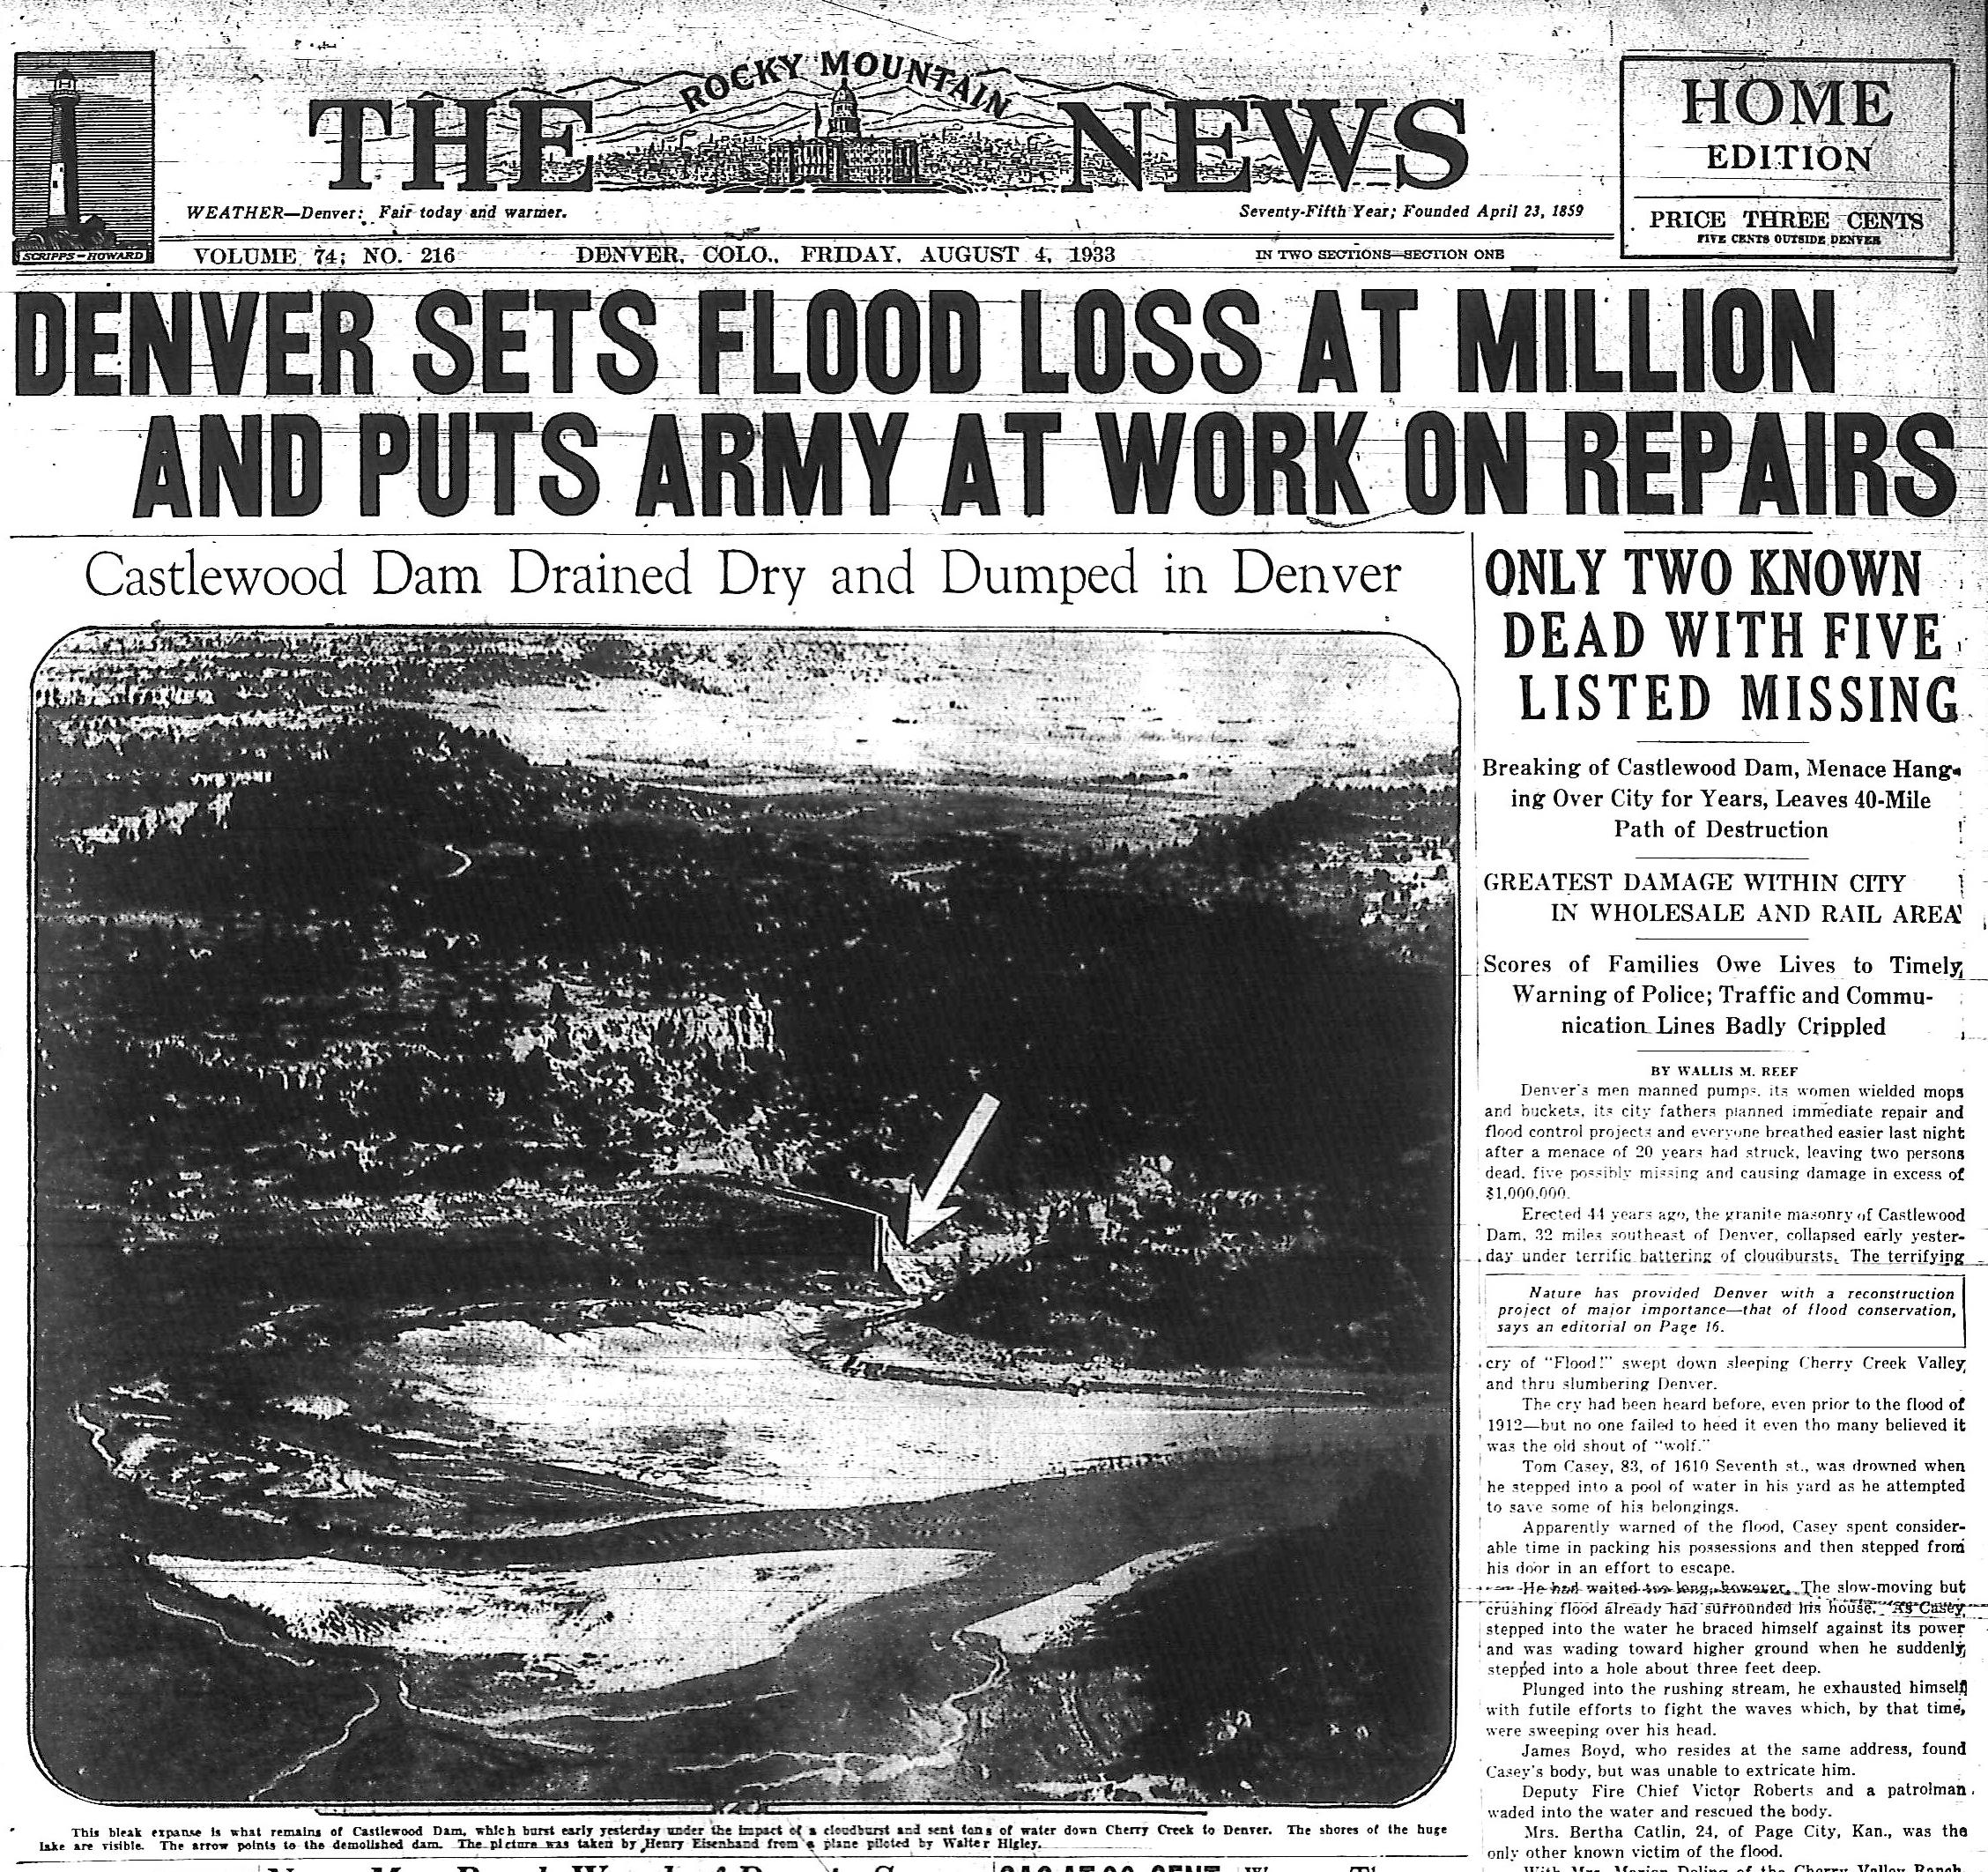 August 3, 1933: Castlewood Dam Breaks, Floods Denver